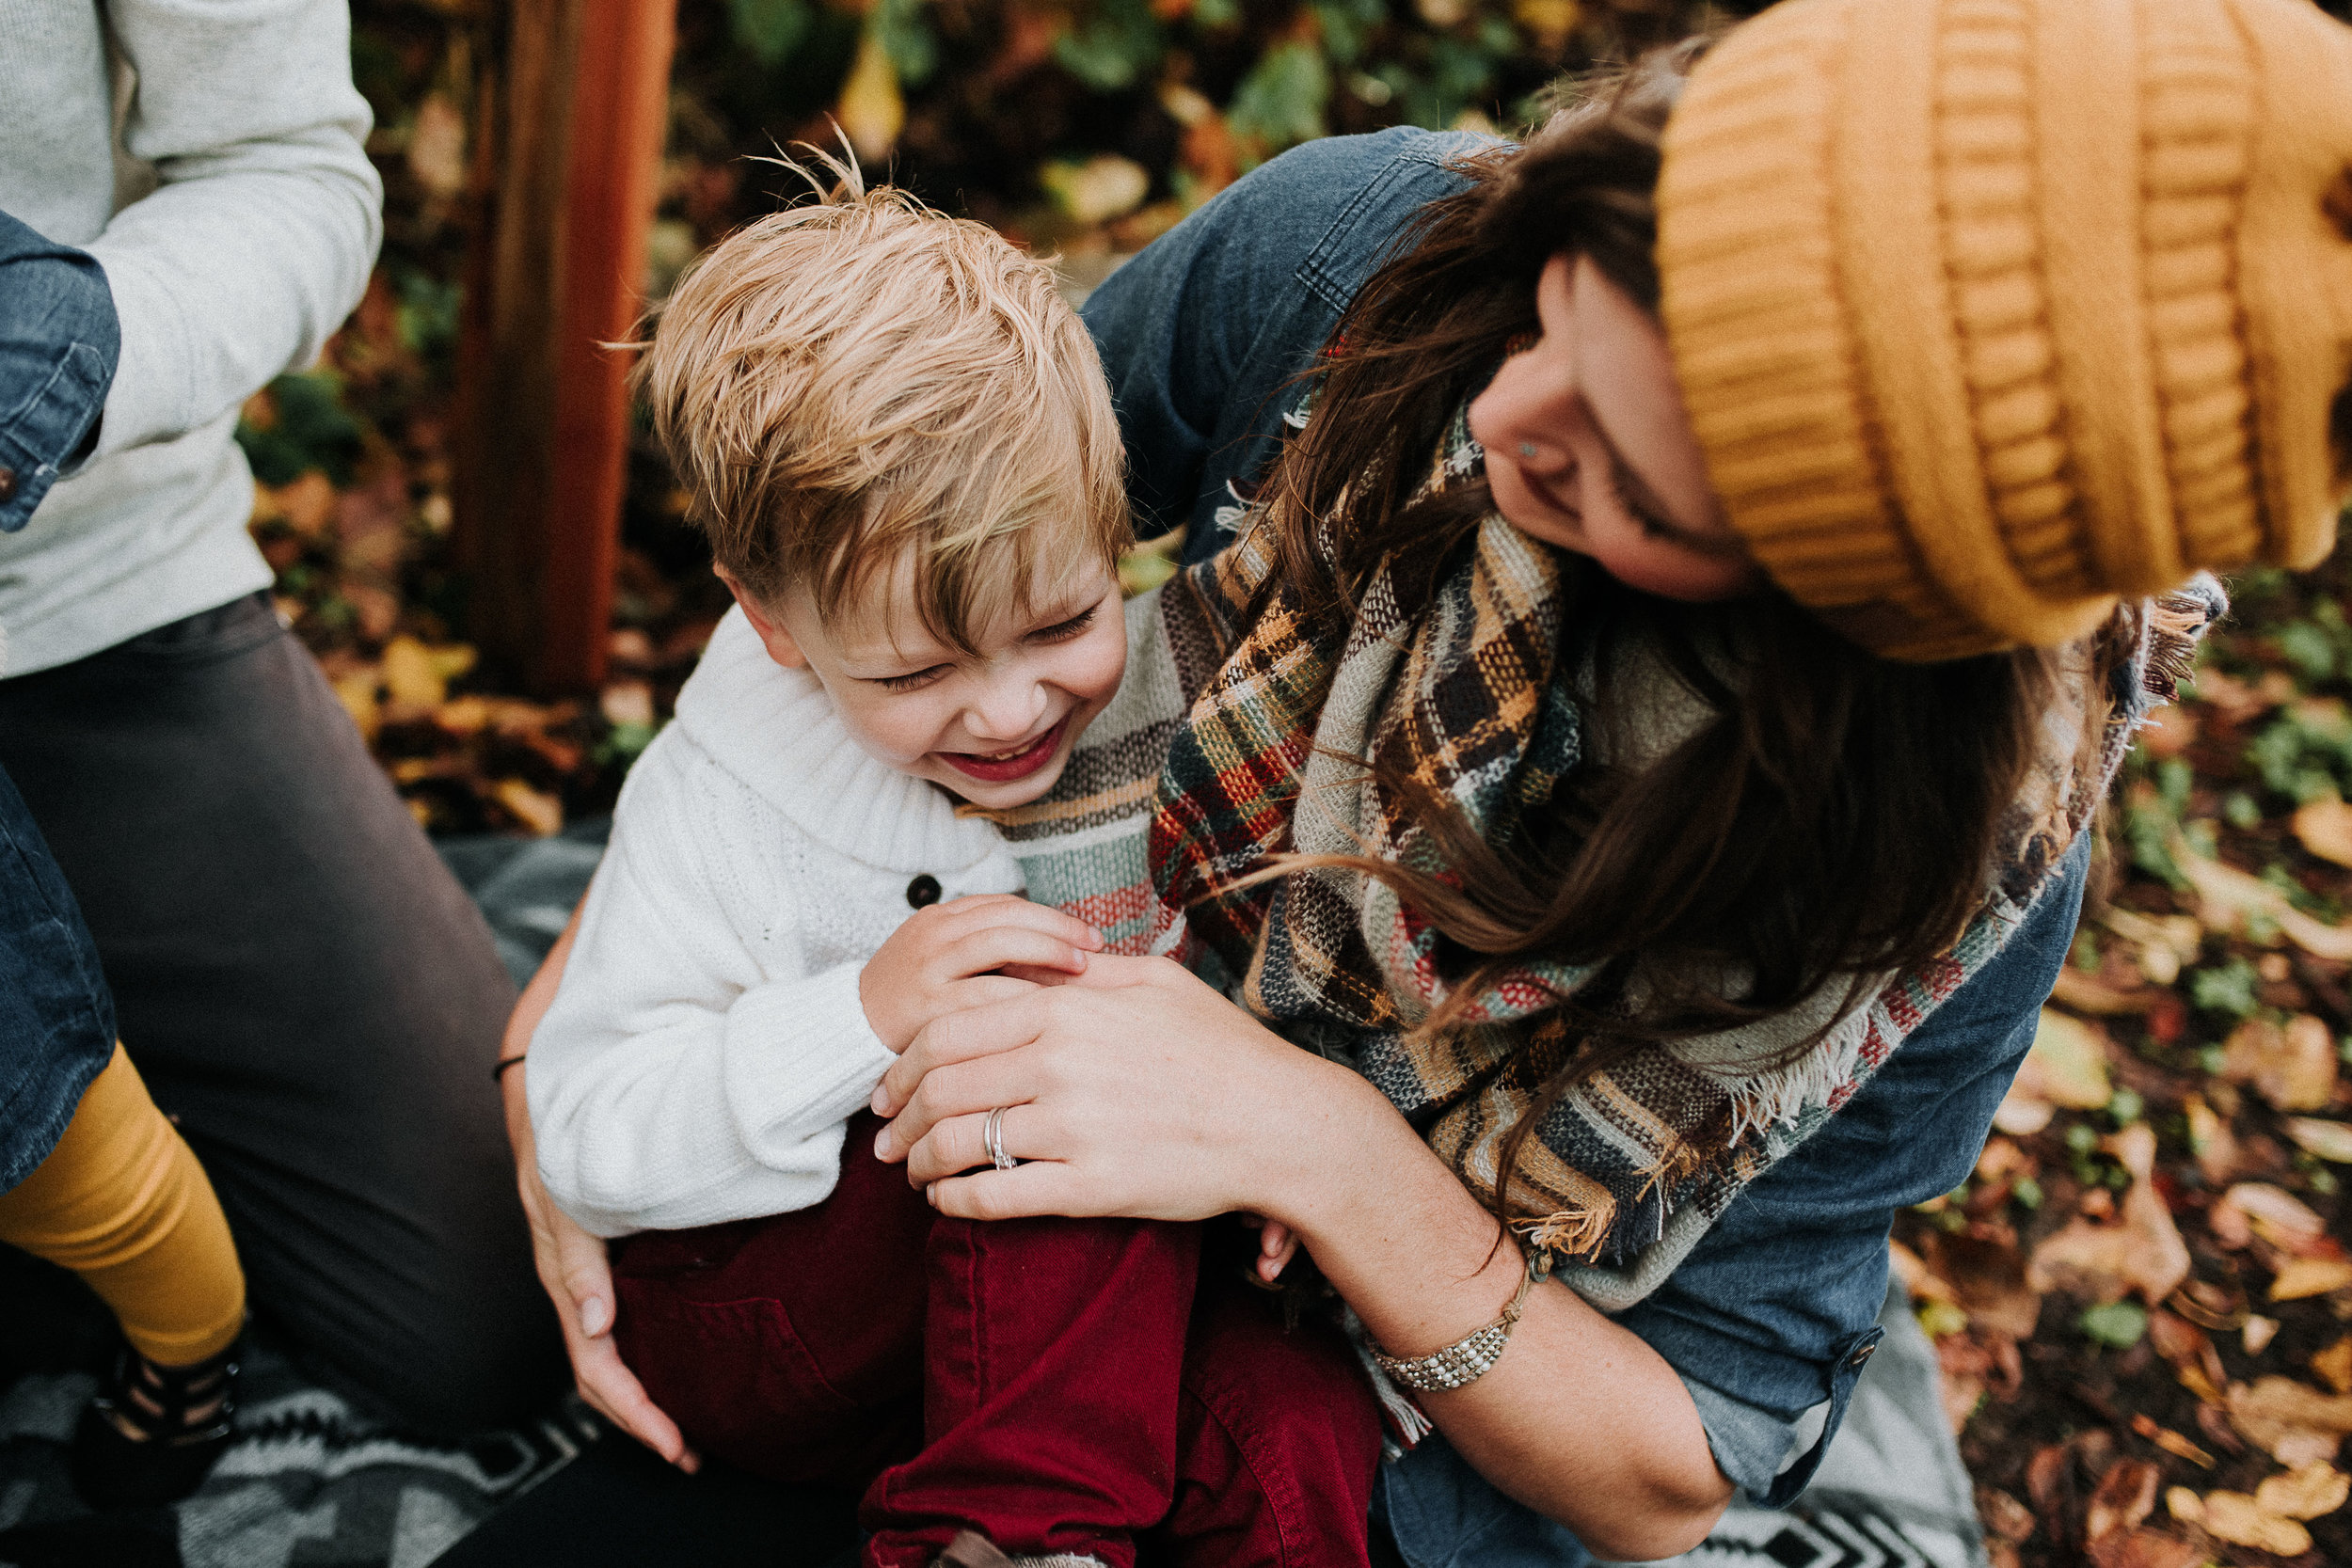 Family-Photographer-Bellingham-WA-Brianne-Bell-Photography-(Miller)64.jpg